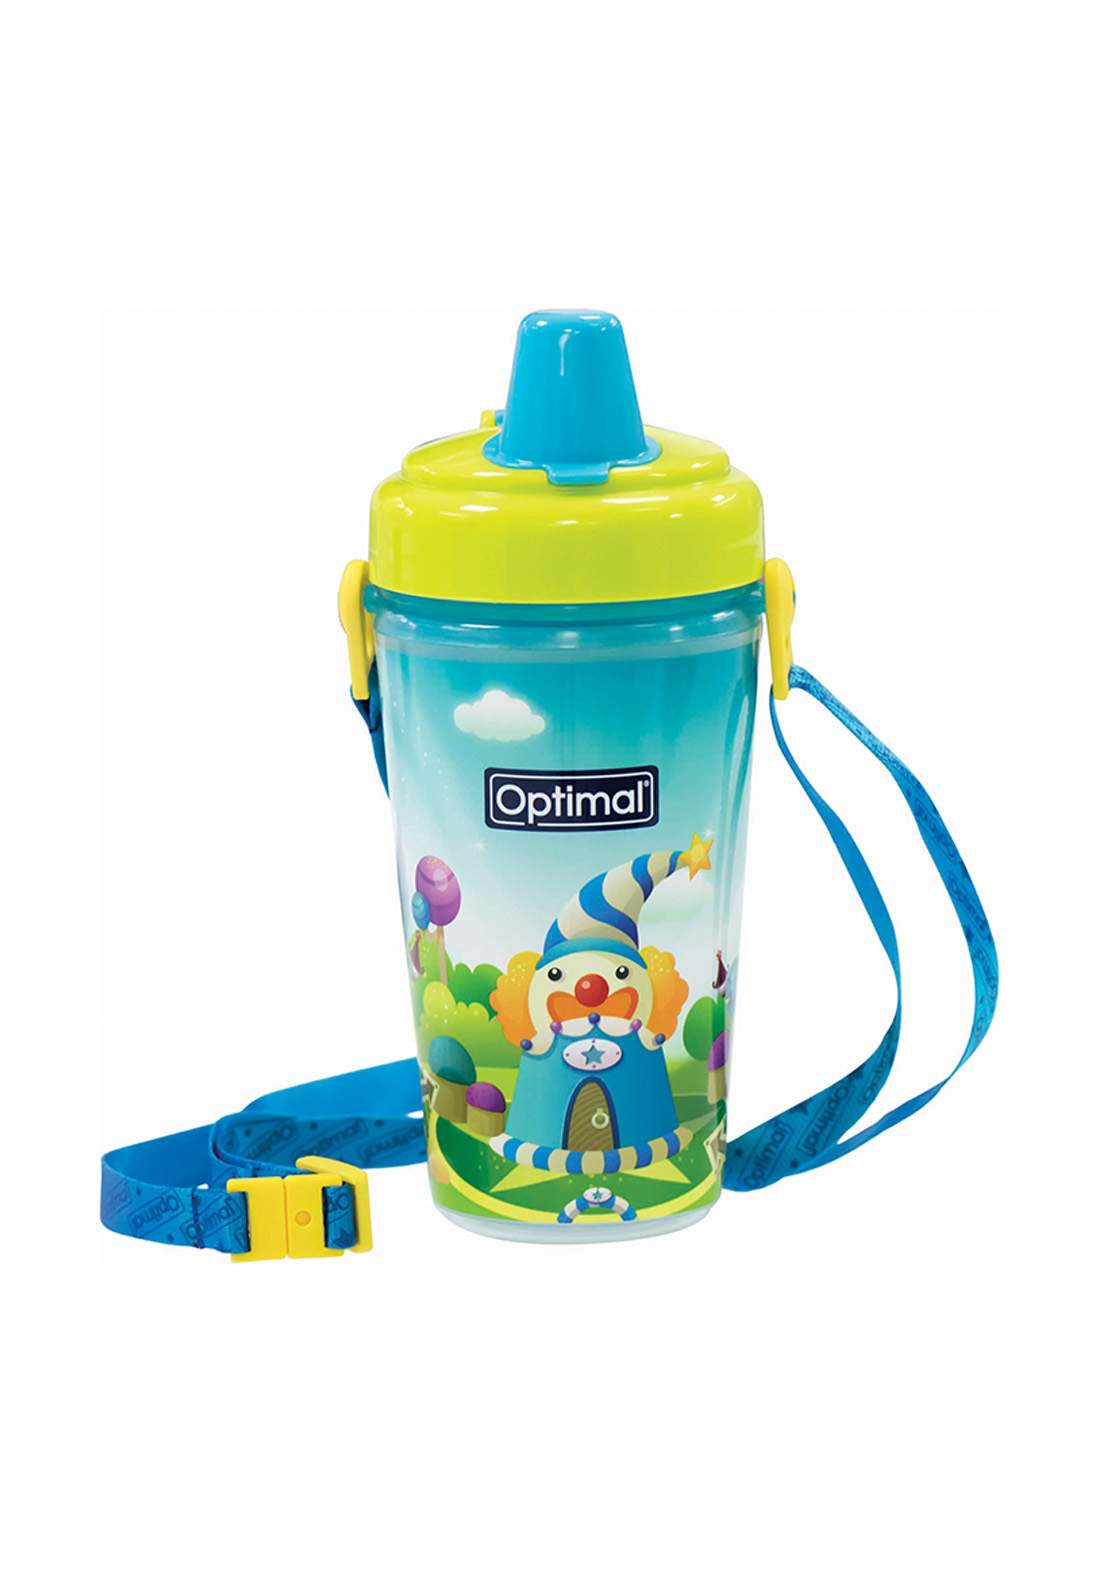 Optimal Silicone Spout Bottle 12m 350ml كوب للاطفال